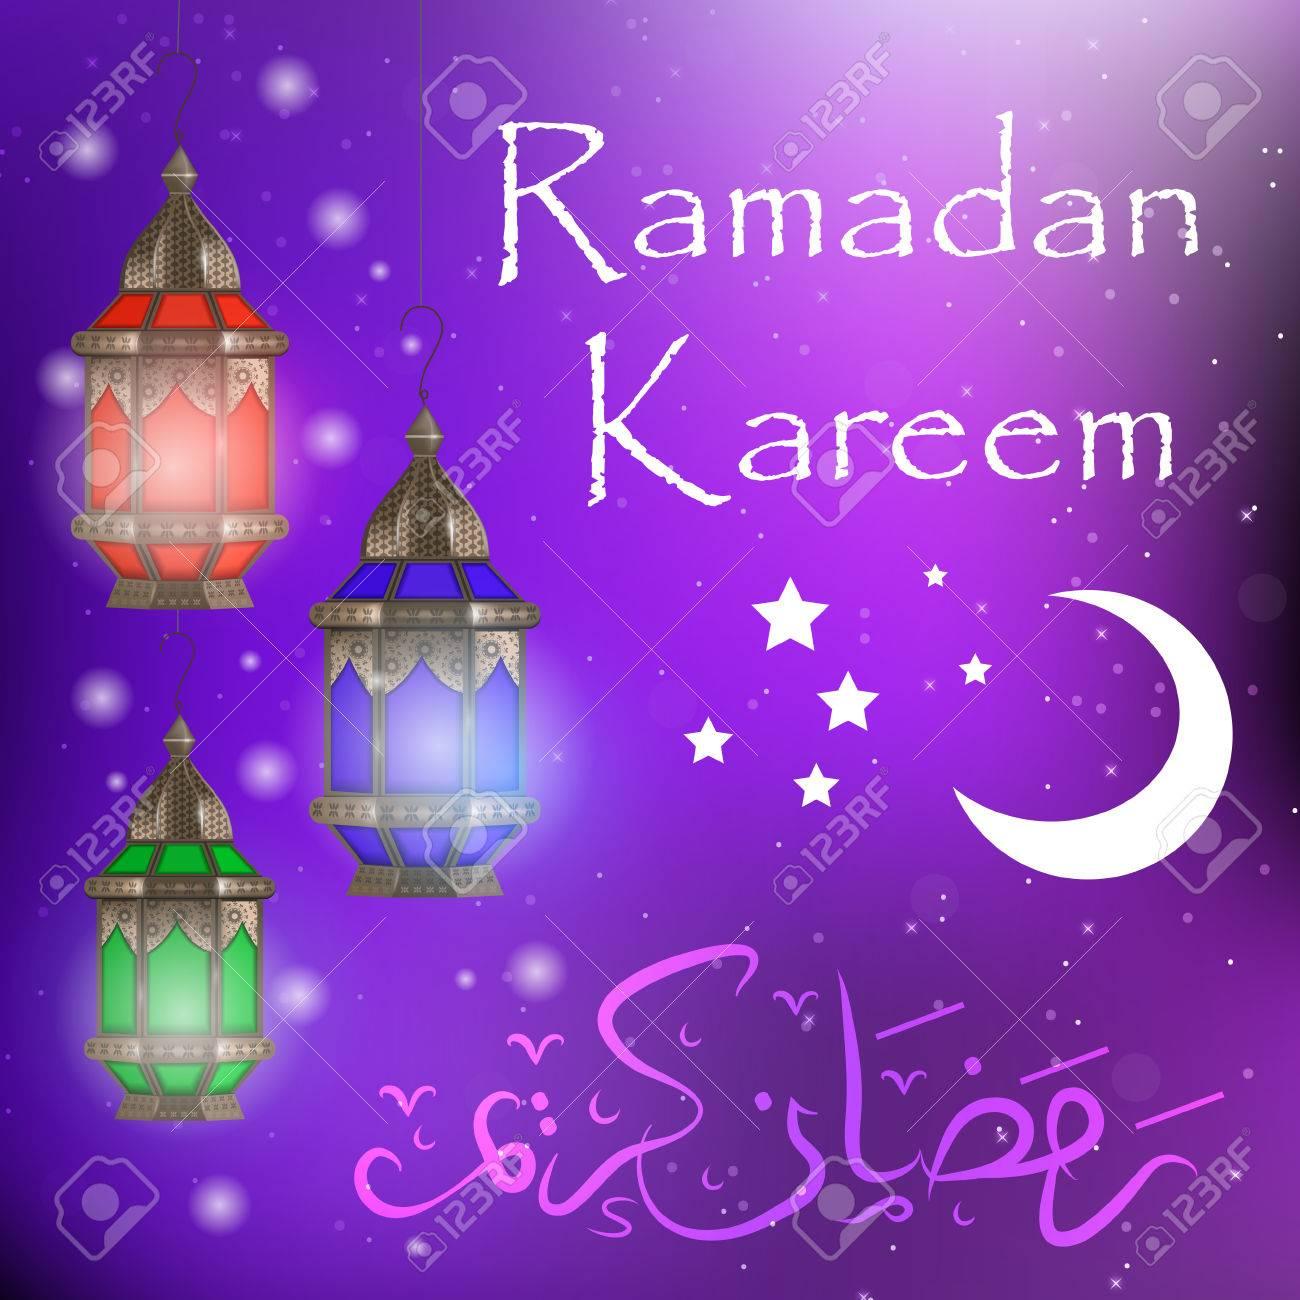 Ramadan kareem greeting card with lanterns template for invitation ramadan kareem greeting card with lanterns template for invitation flyer muslim religious holiday stopboris Image collections